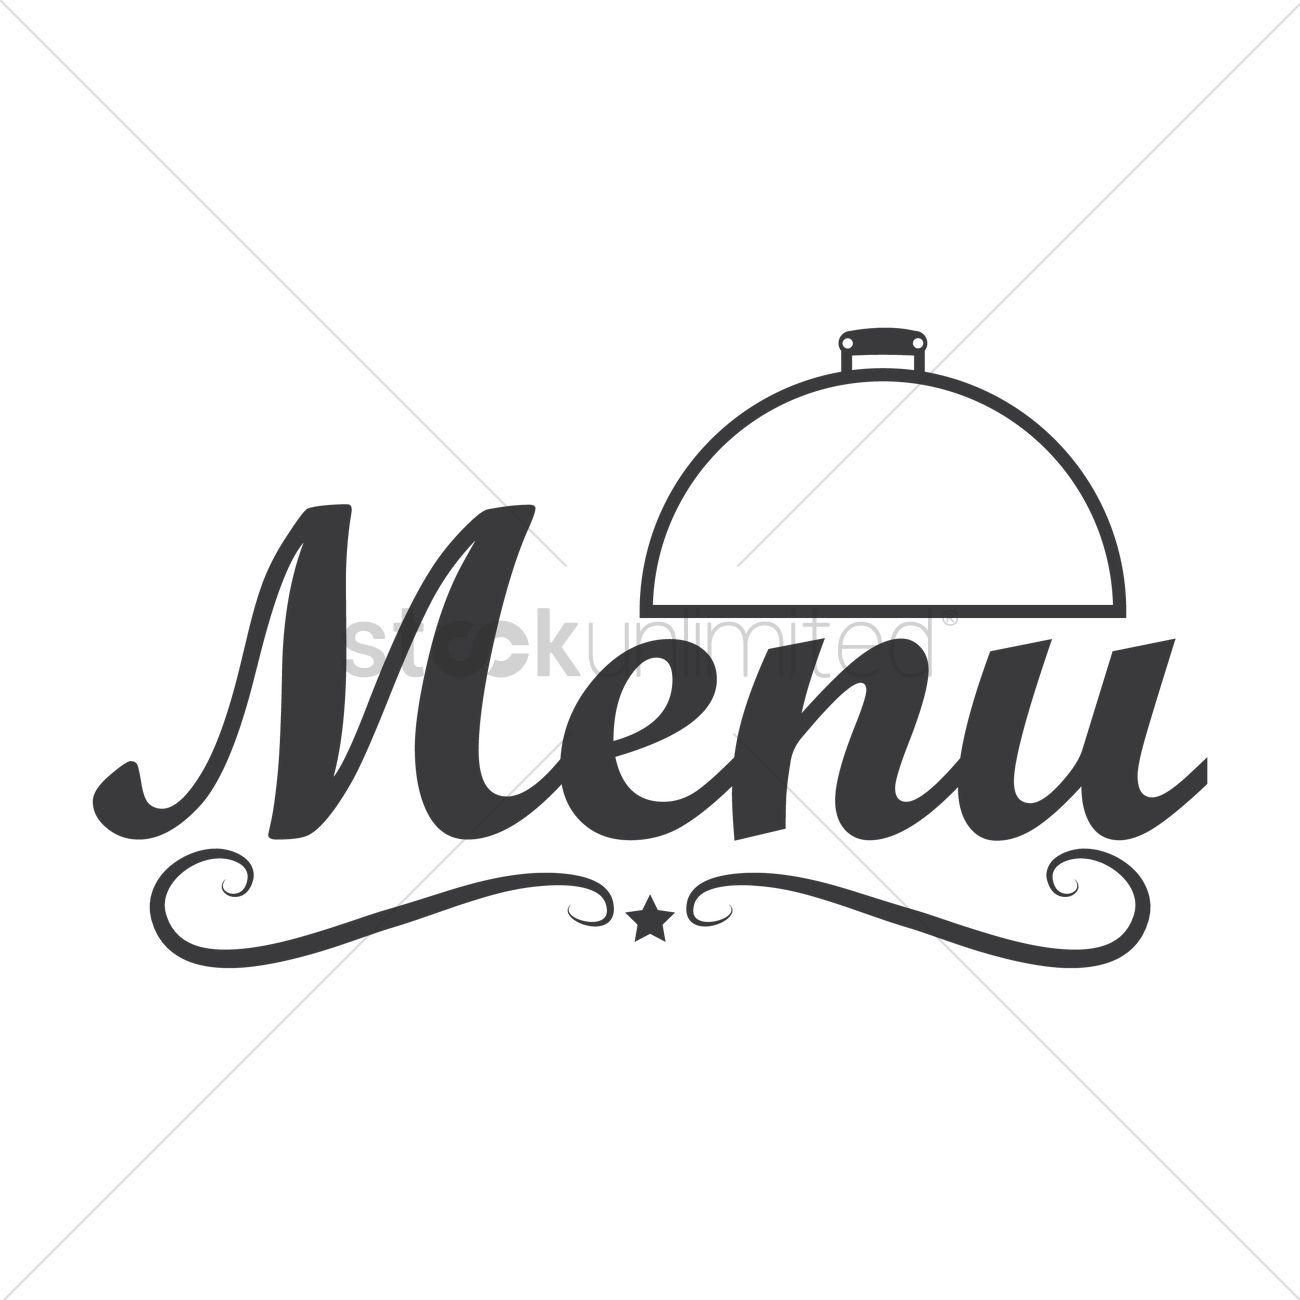 restaurant logo clipart - photo #34